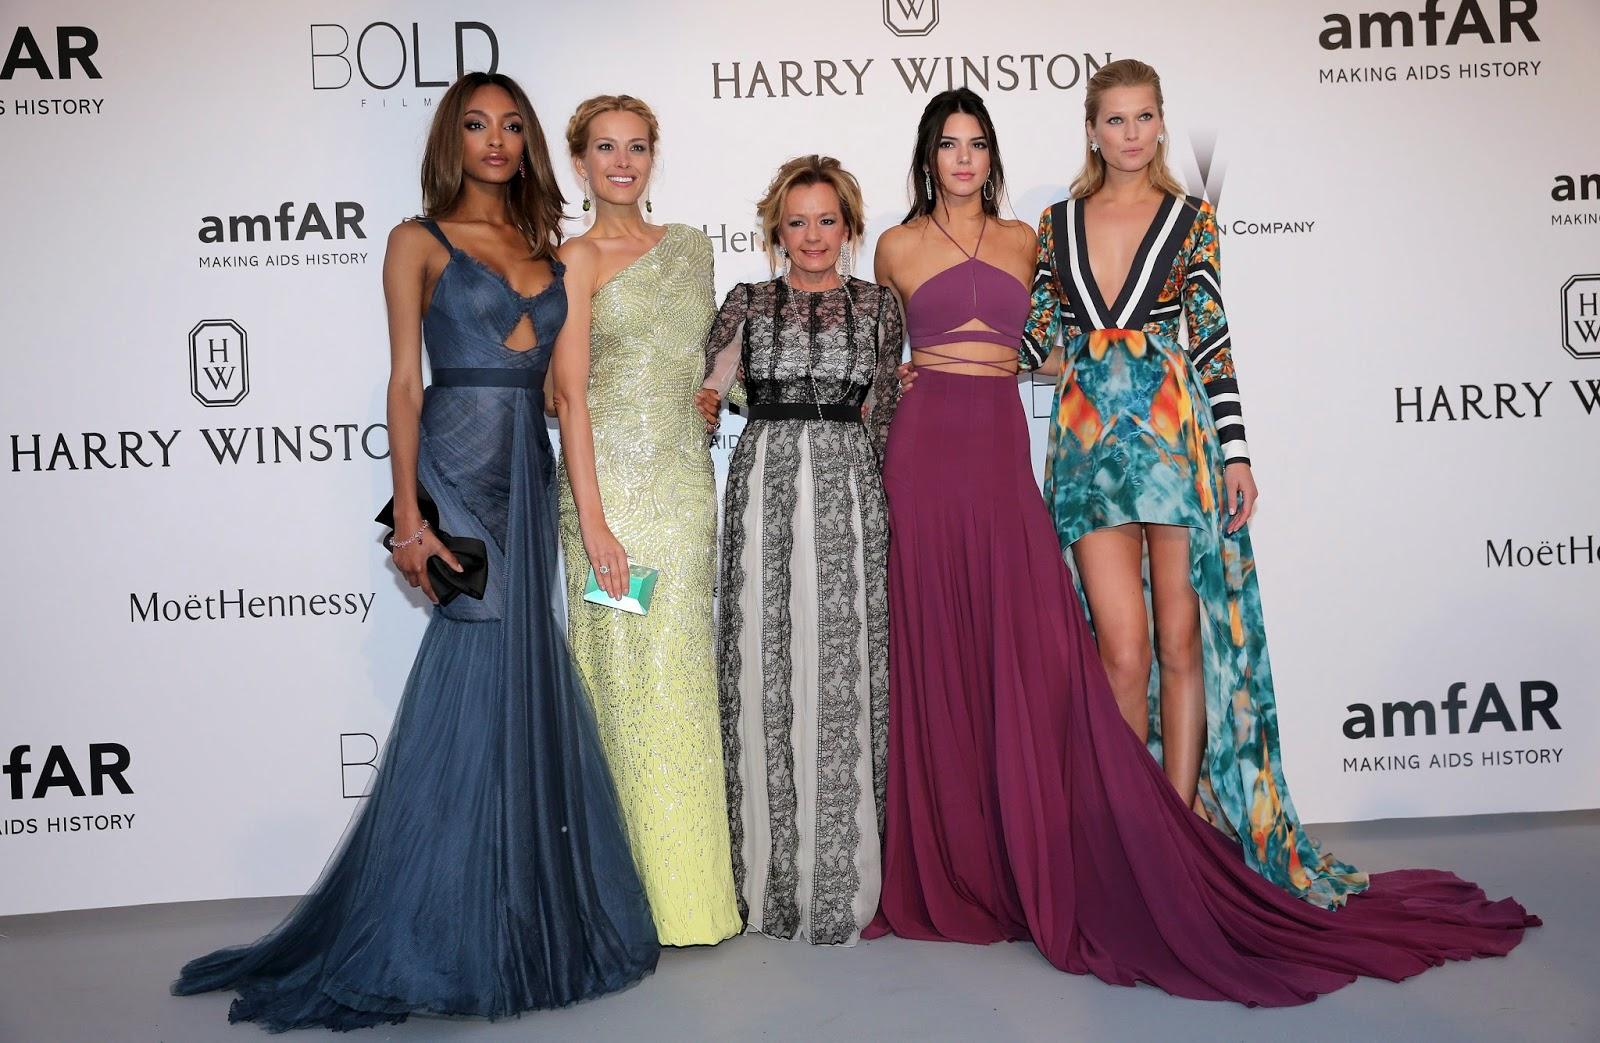 Cannes 2015 - Jourdan Dunn, Petra Nemcova, Caroline Scheufele, Kendall Jenner and Toni Garrn